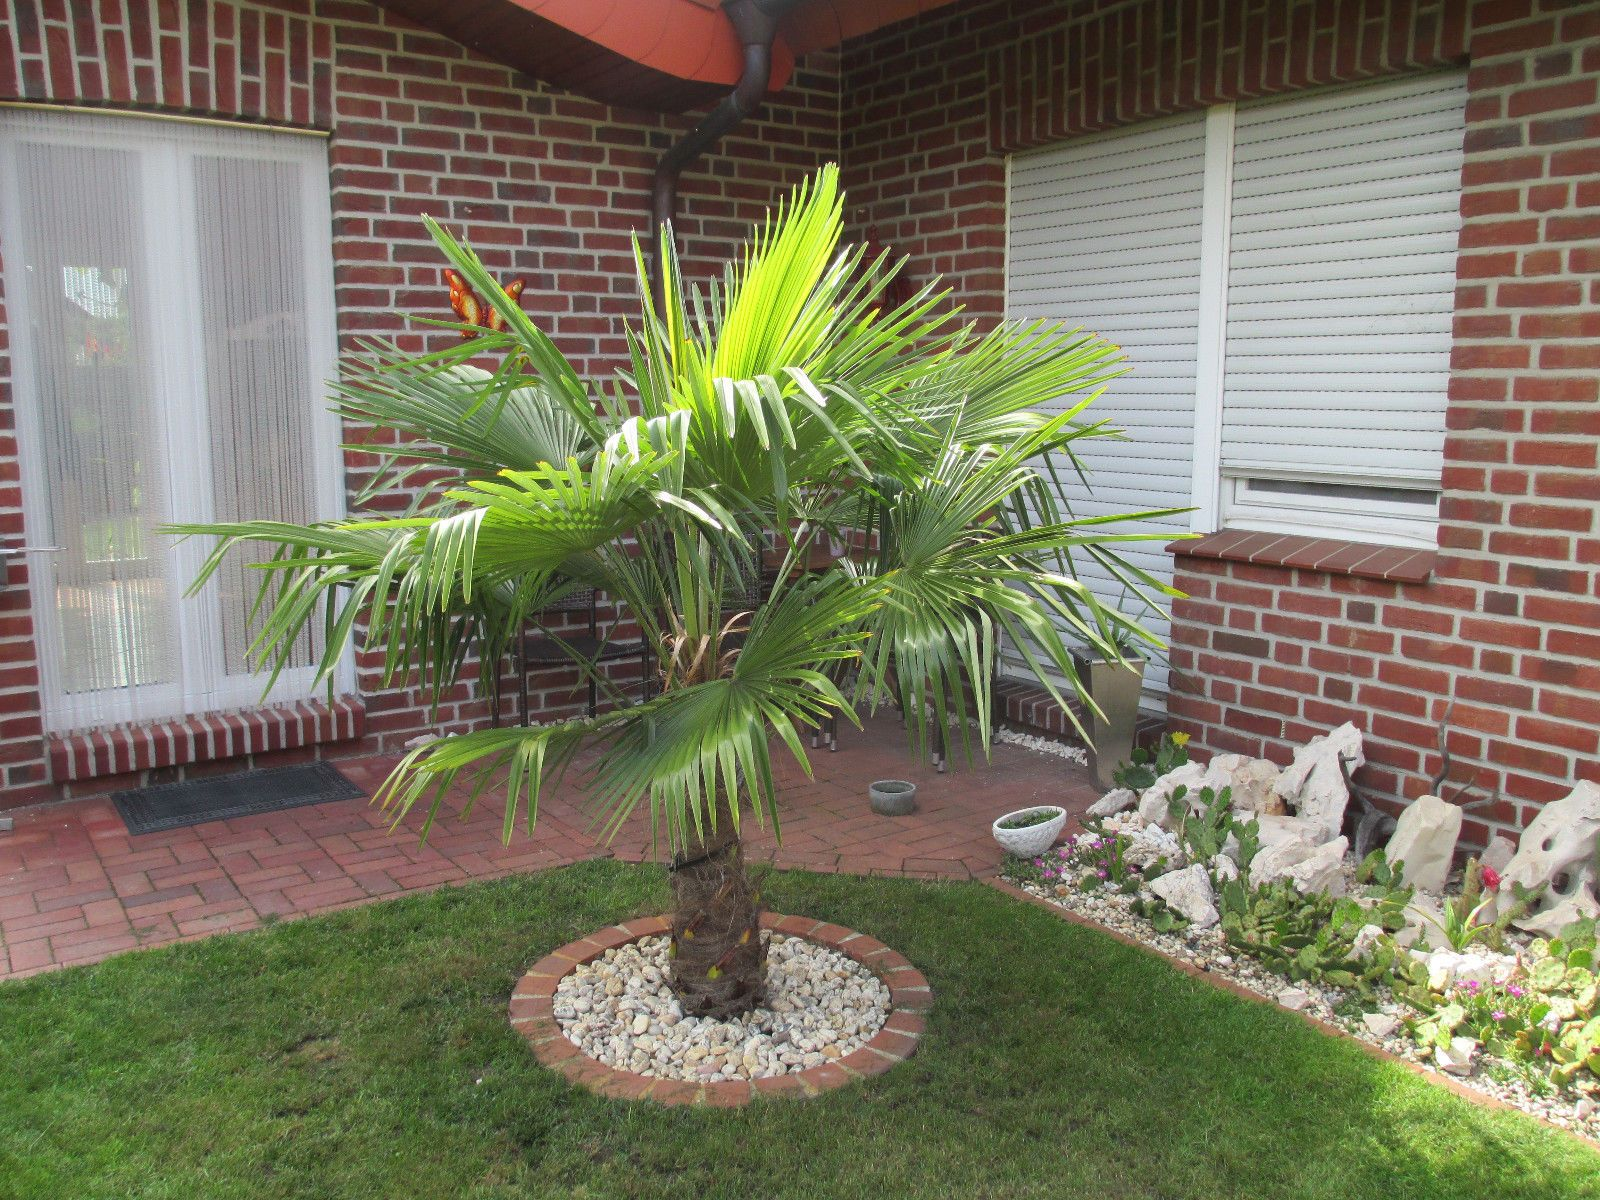 Trachycarpus fortunei Hanfpalme winterhart bis 17°C Palme